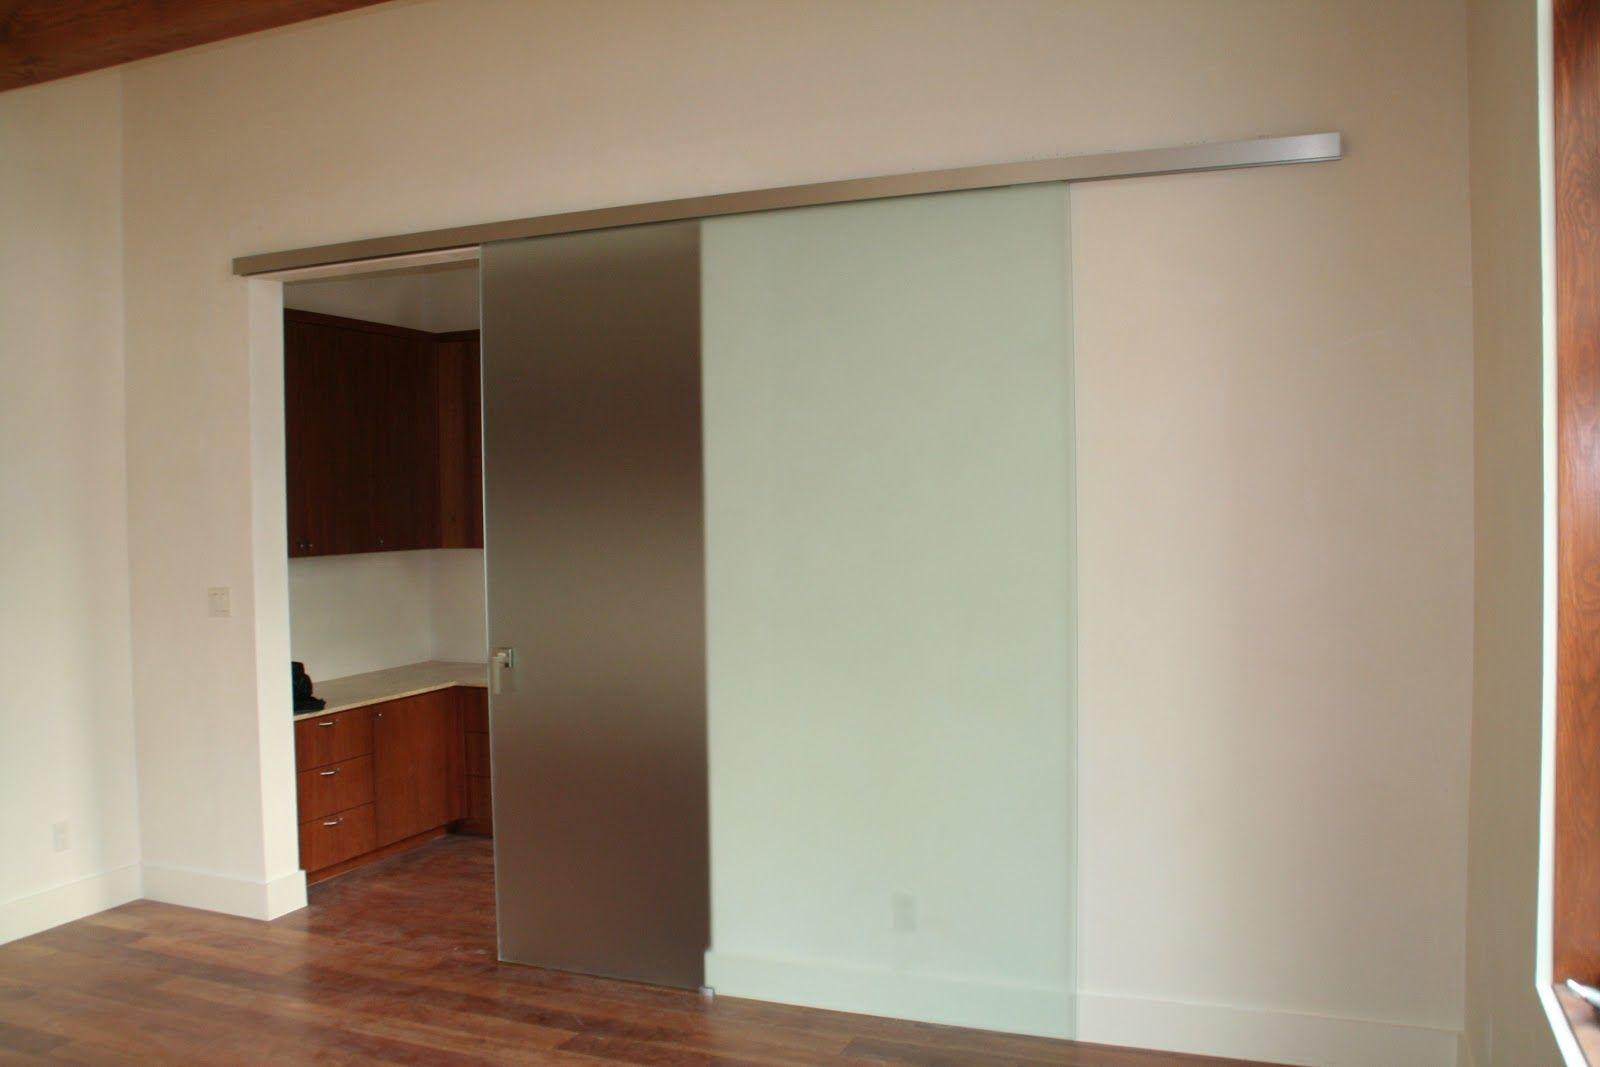 Sliding Room Divider Home Depot   WoodWorking Projects U0026 Plans